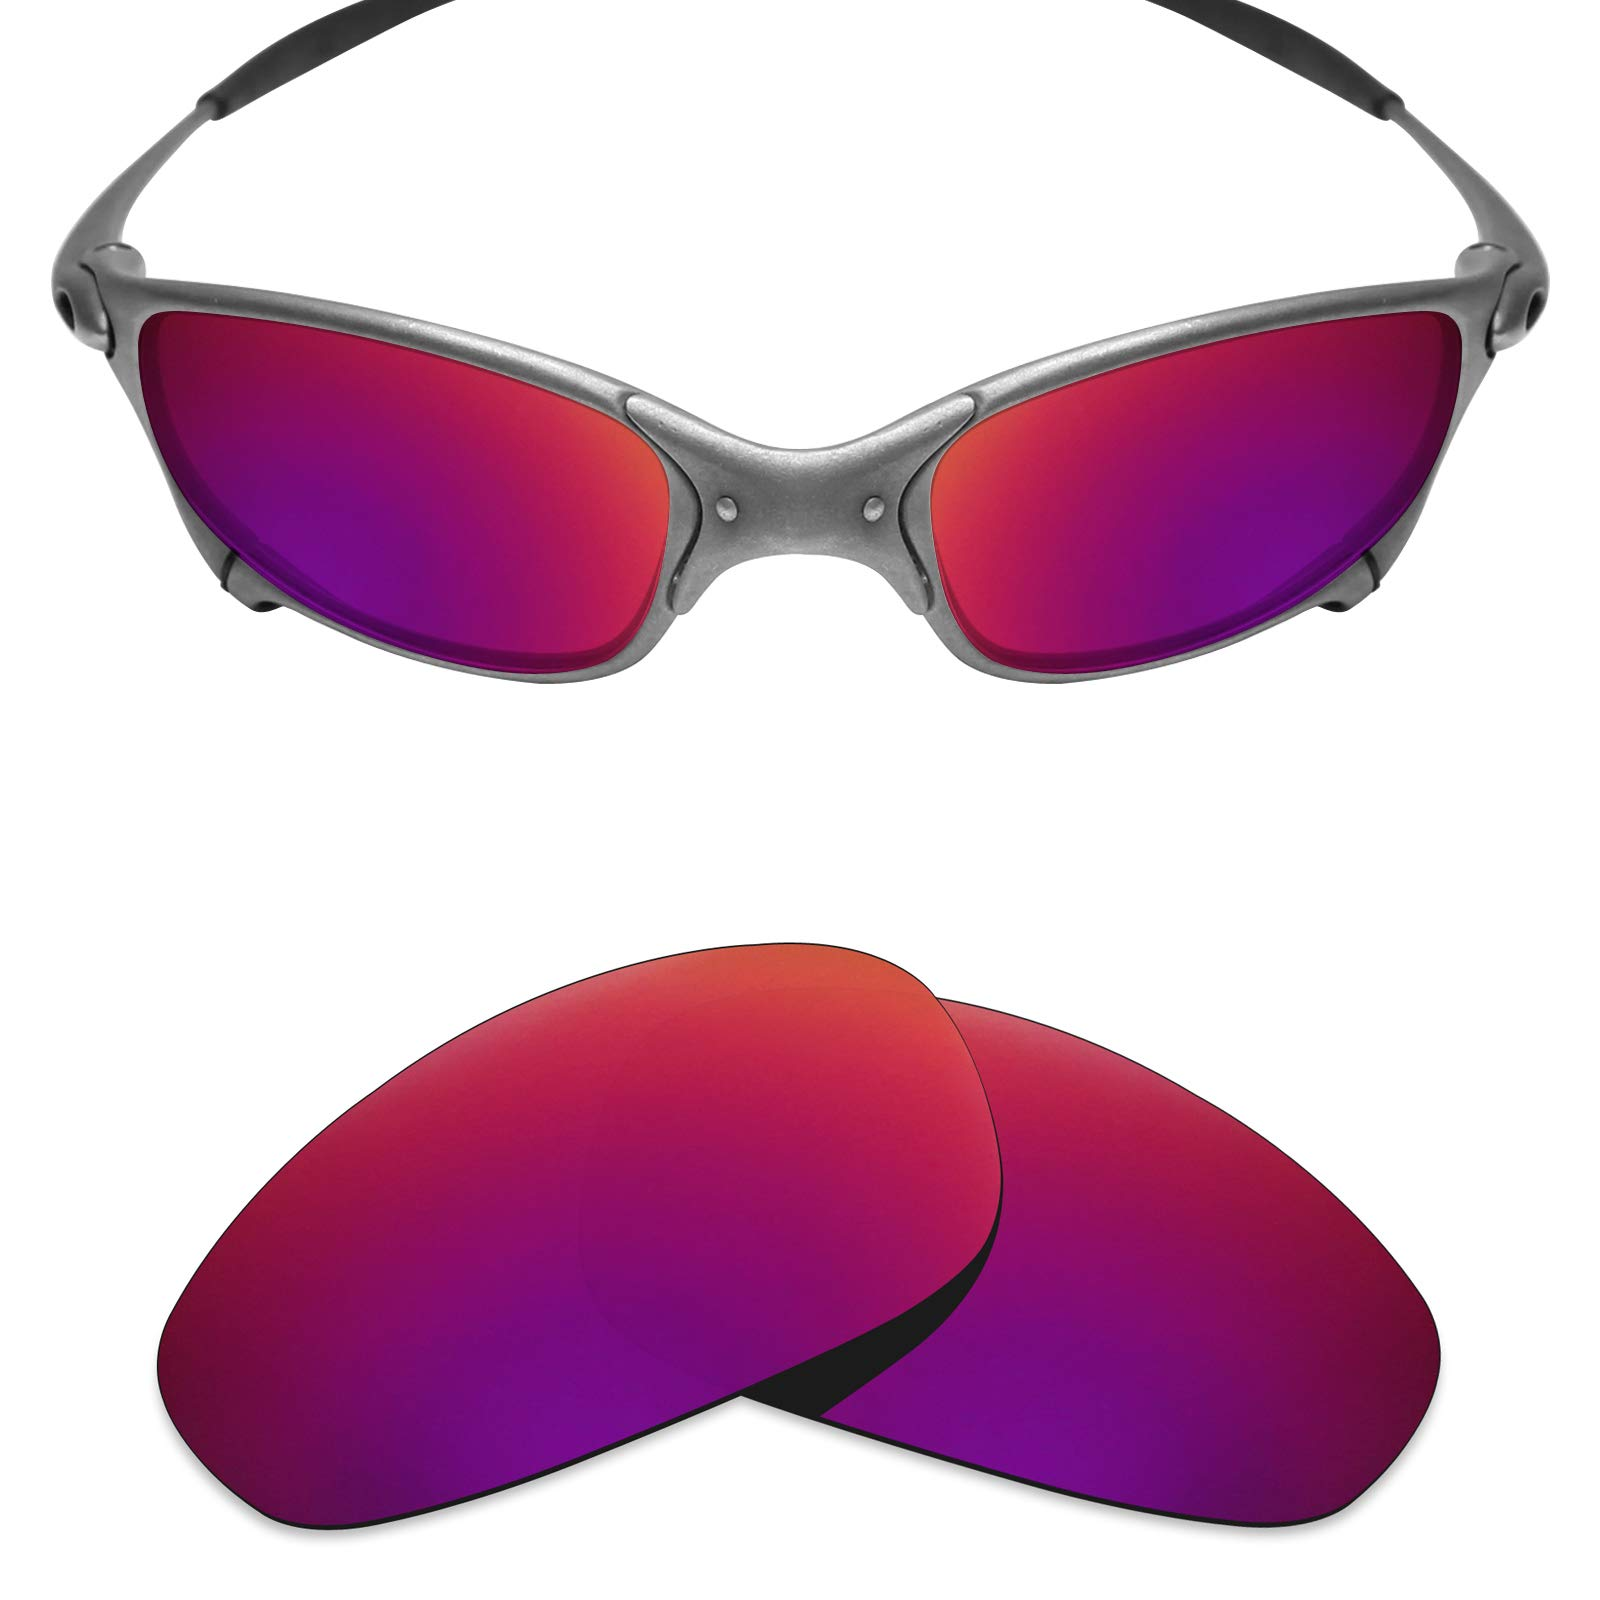 544ec5d42 Galleon - Mryok Polarized Replacement Lenses For Oakley Juliet - Midnight  Sun